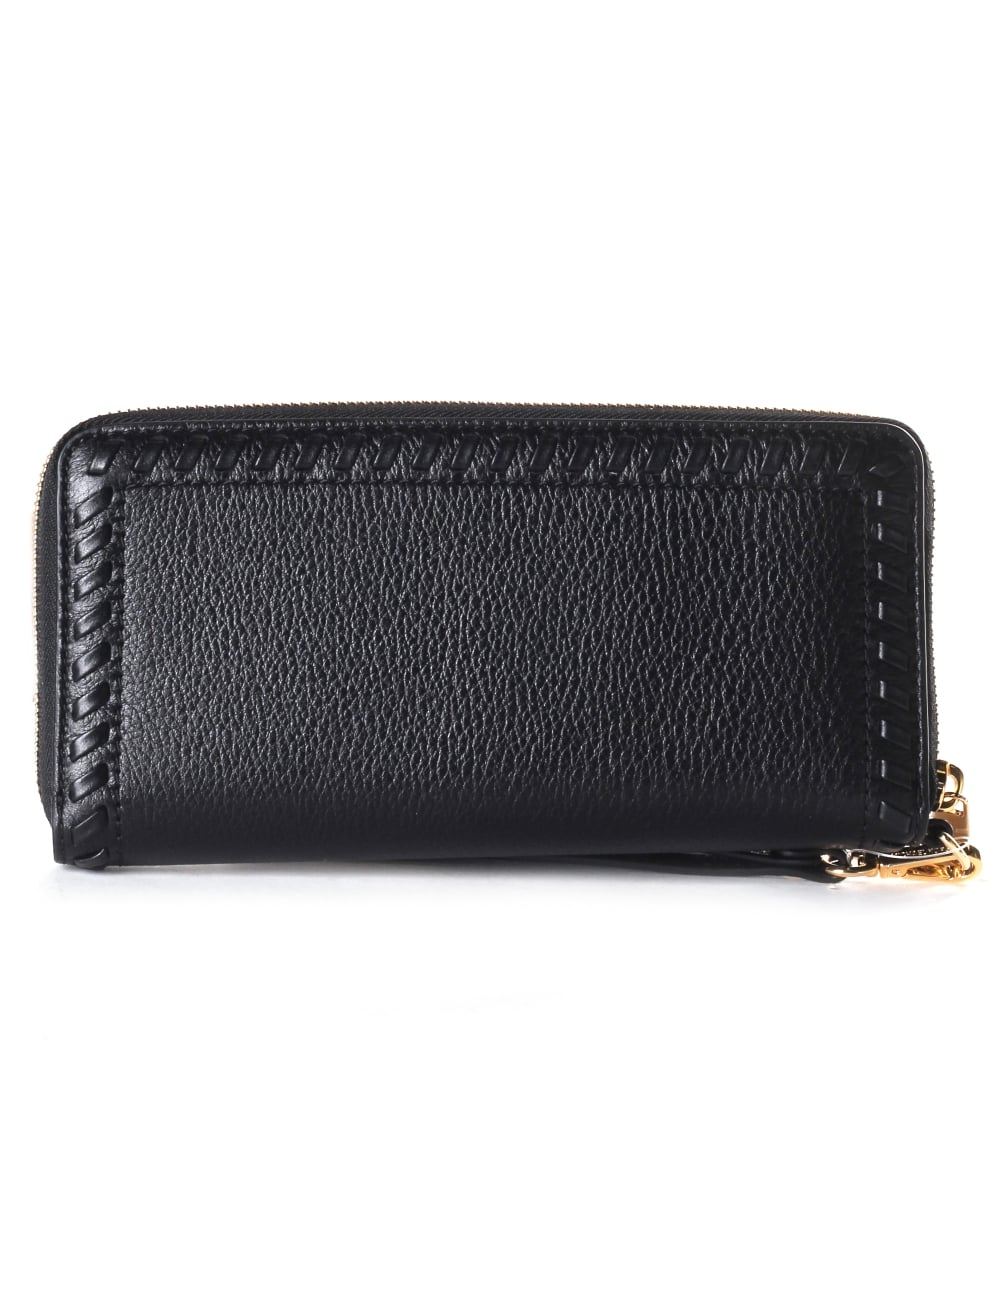 8027d6c2bda9 Michael Kors Women's Lauryn Travel Continental Wristlet Wallet